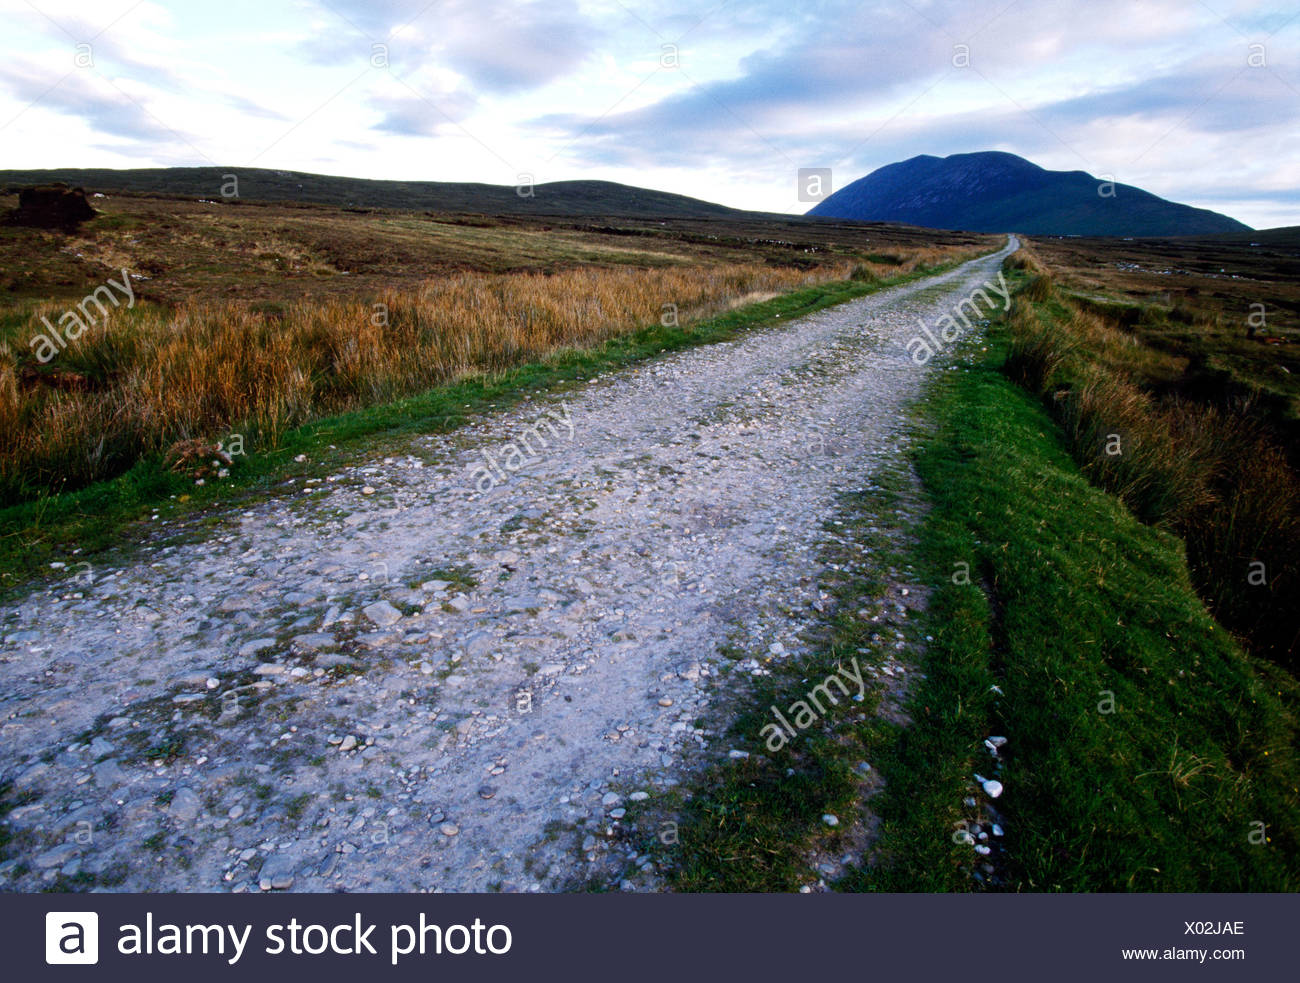 Slievemore Mountain, Achill Island, County Mayo, Ireland Stock Photo